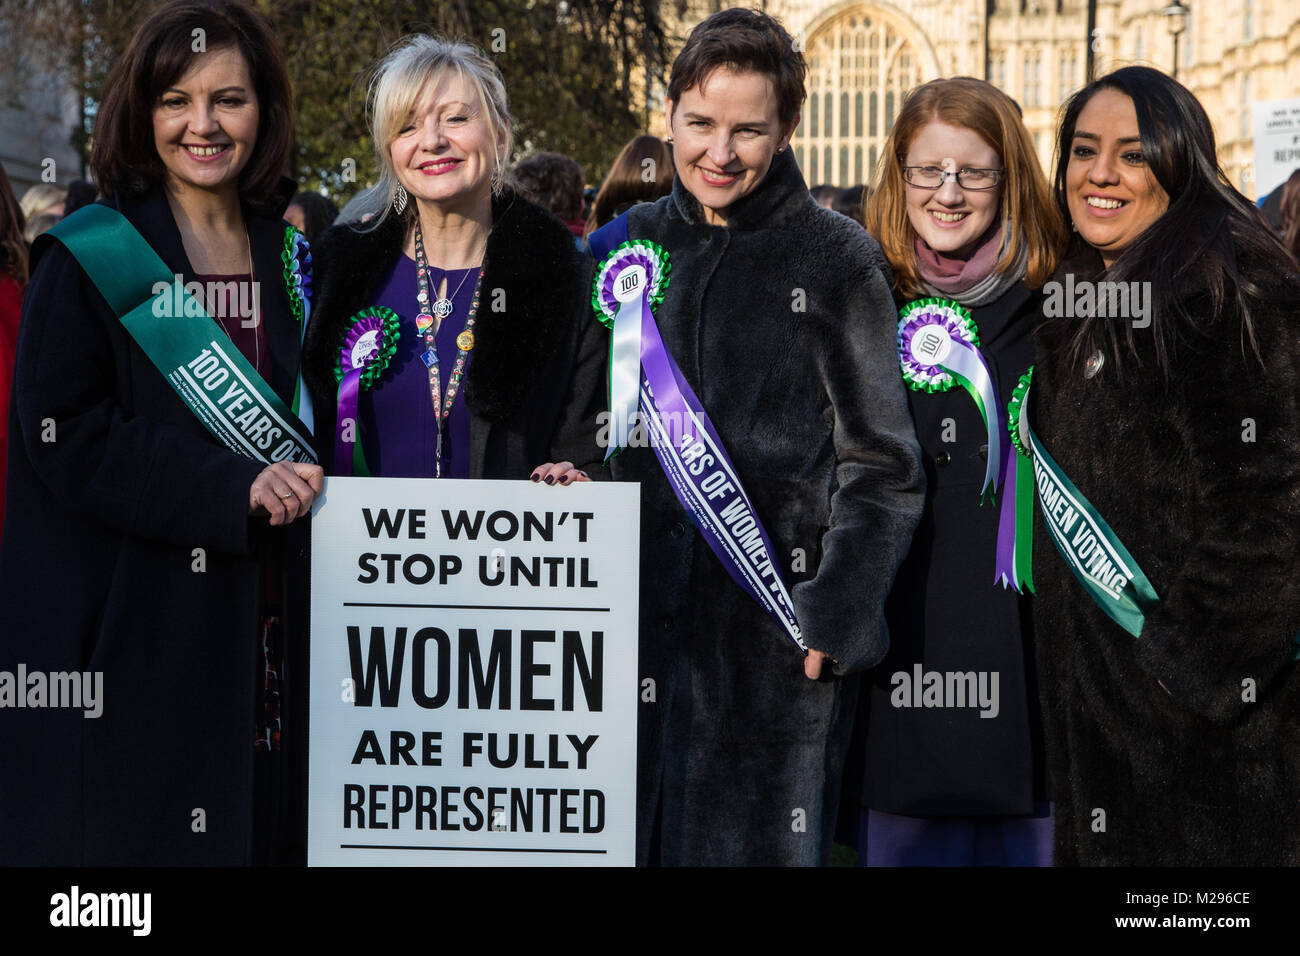 London, UK. 6th Feb, 2018. Caroline Flint MP, Tracy Brabin MP, Mary Creagh MP, Holly Lynch MP and Naz Shah MP attend - Stock Image